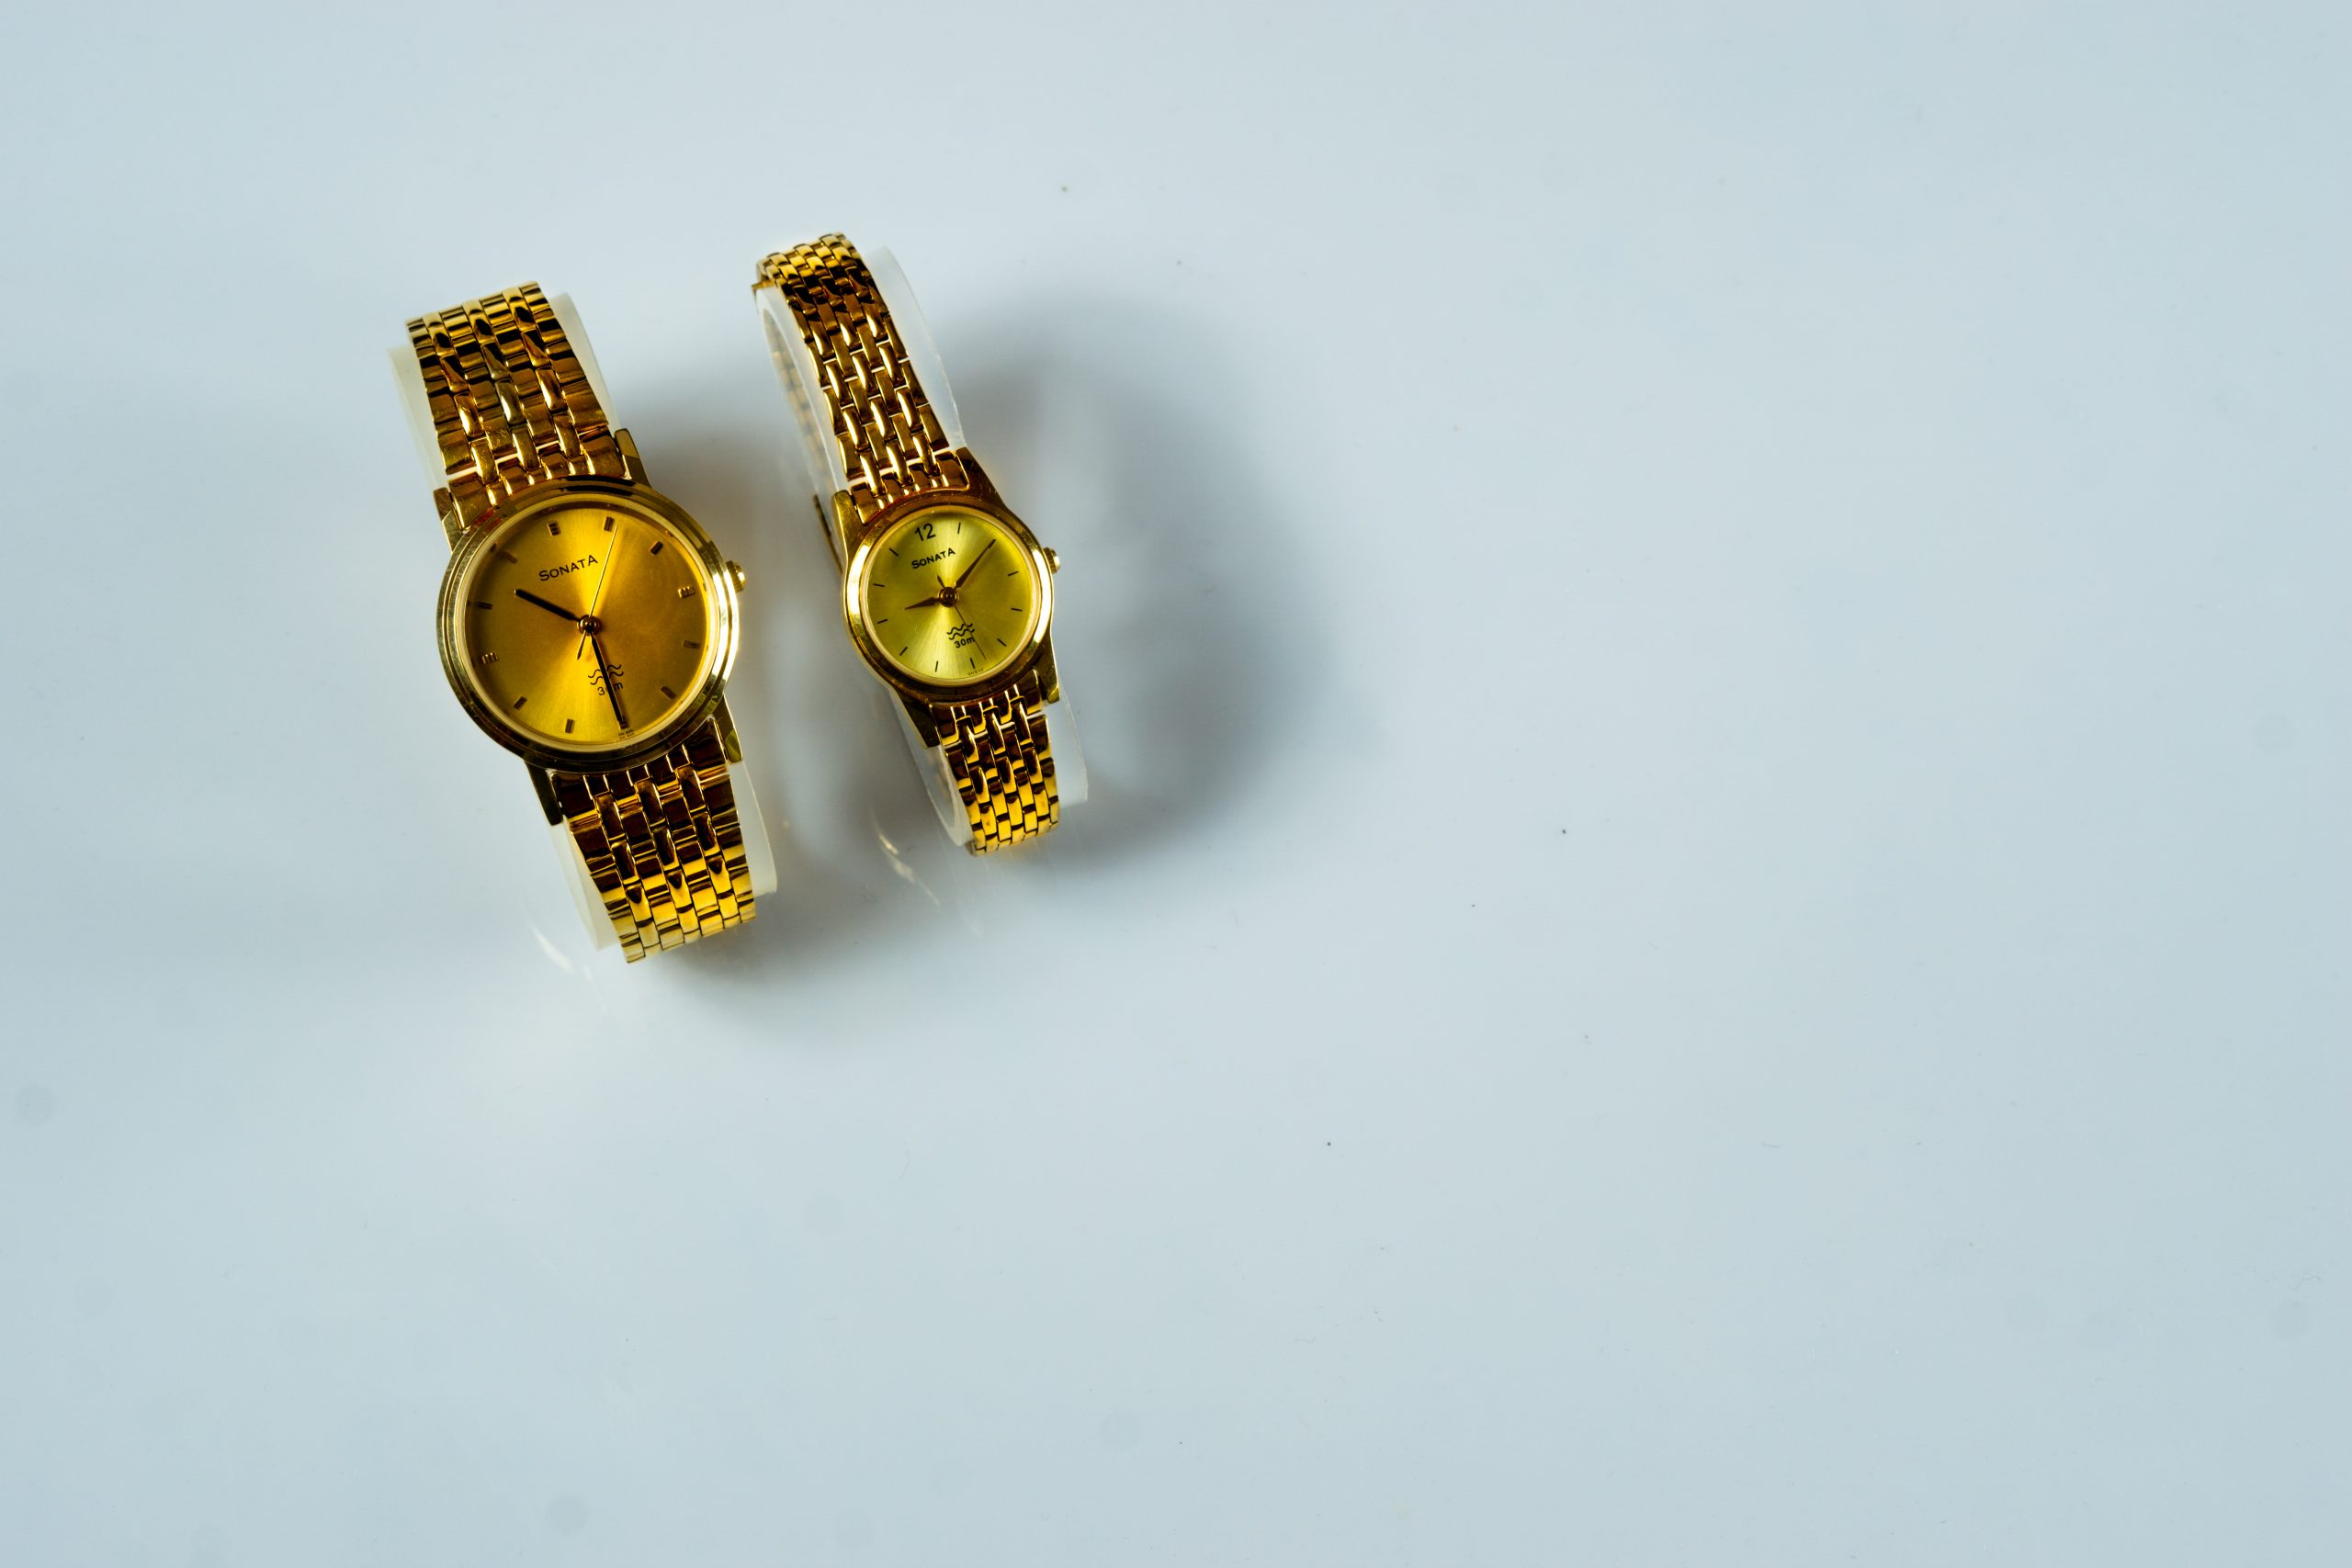 A pair of golden wrist watches